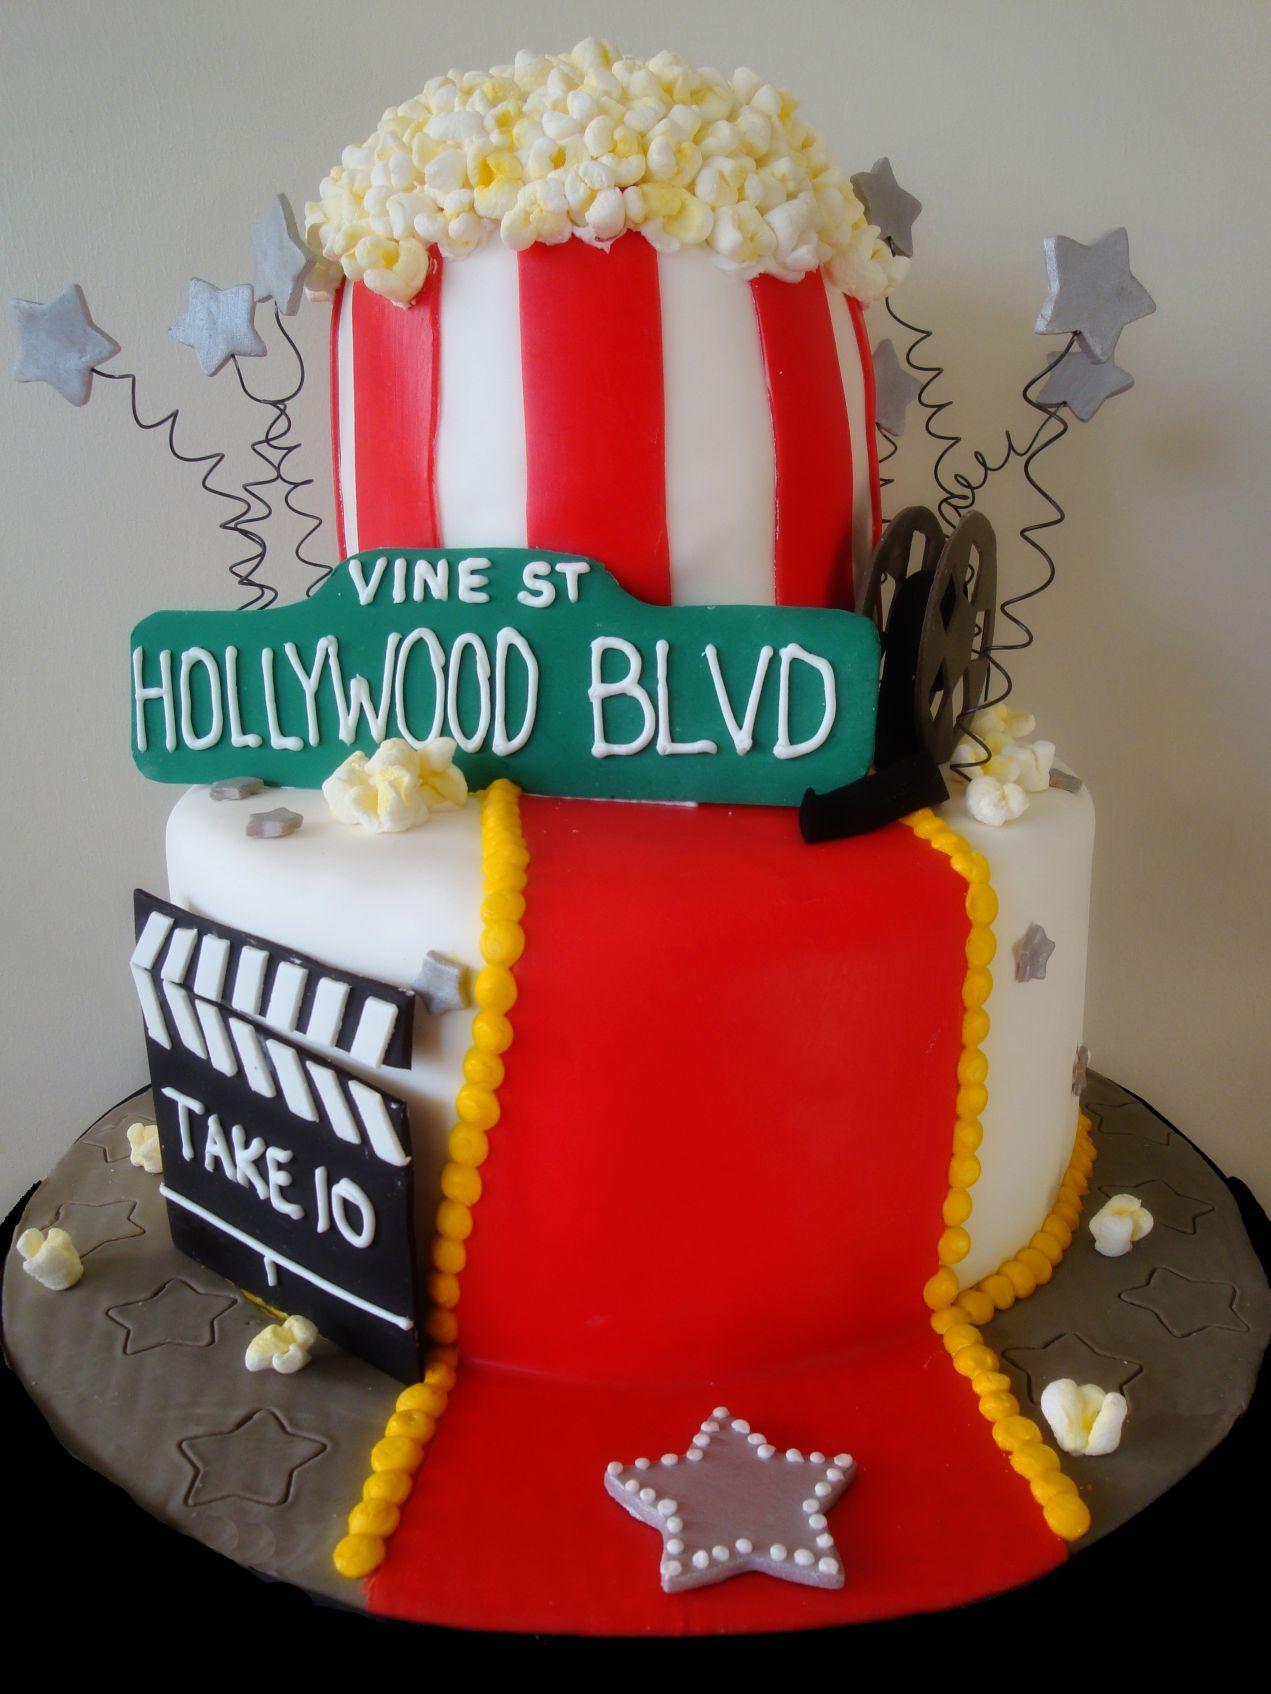 Tremendous Hollywood Birthday Cake Thats My Cake Funny Birthday Cards Online Alyptdamsfinfo